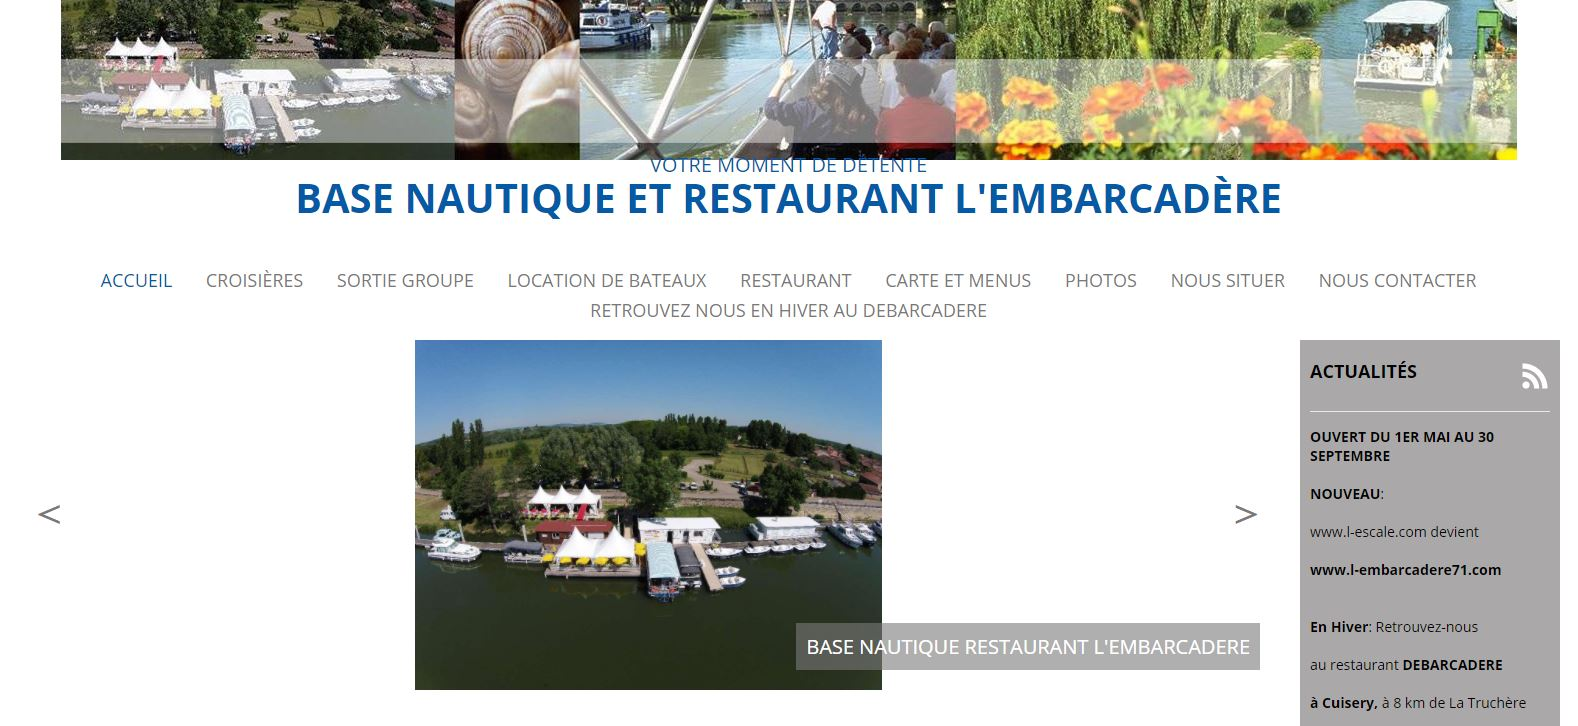 Restaurant L'Embarcadère in La Truchère (nur im Sommer)